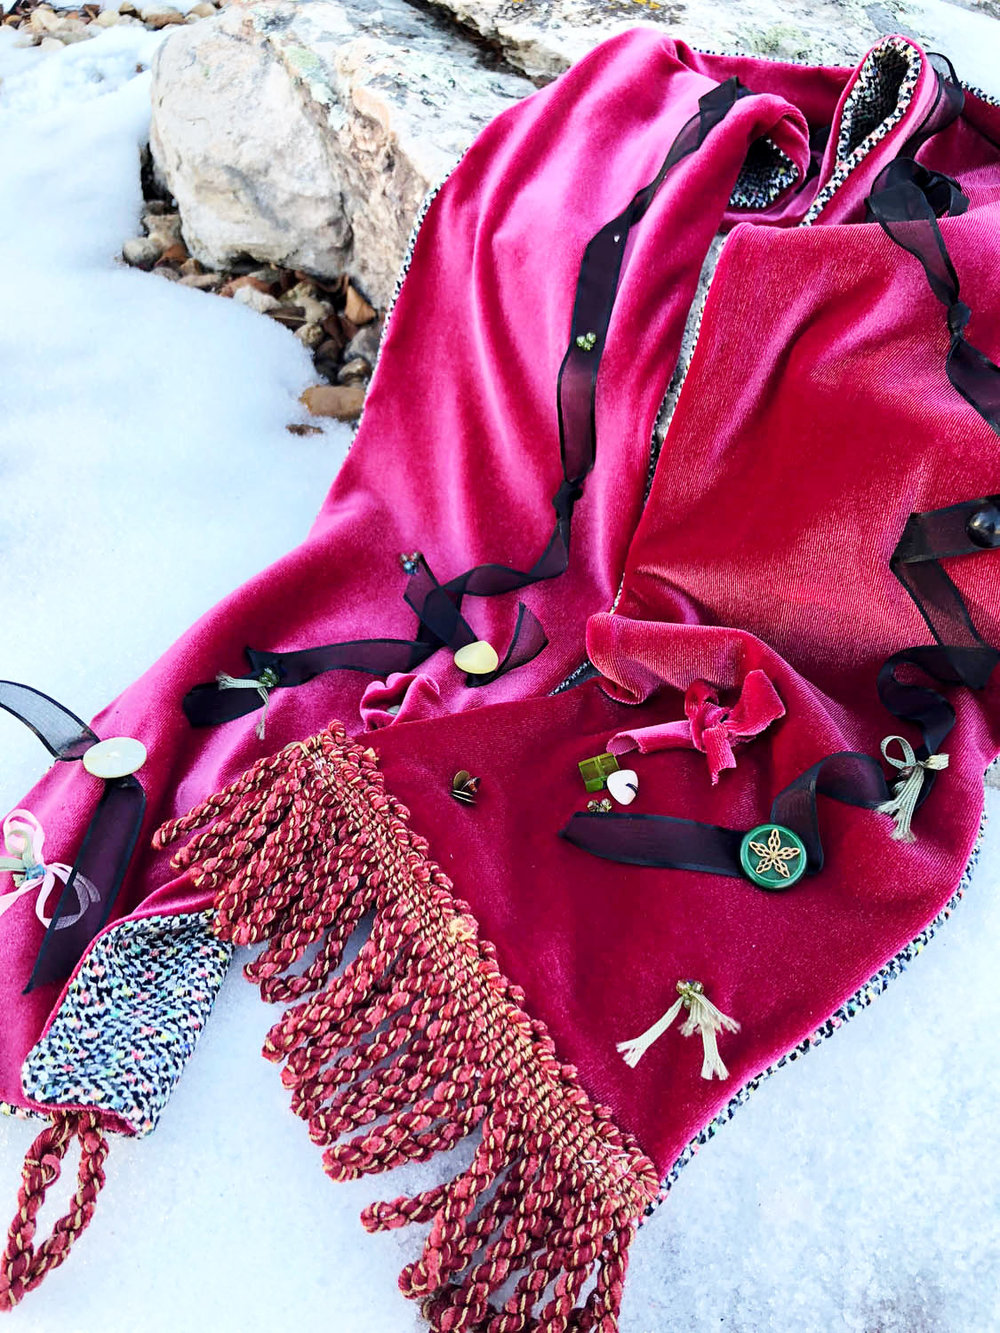 Hand made embellished velvet dressy winter scarf on snow